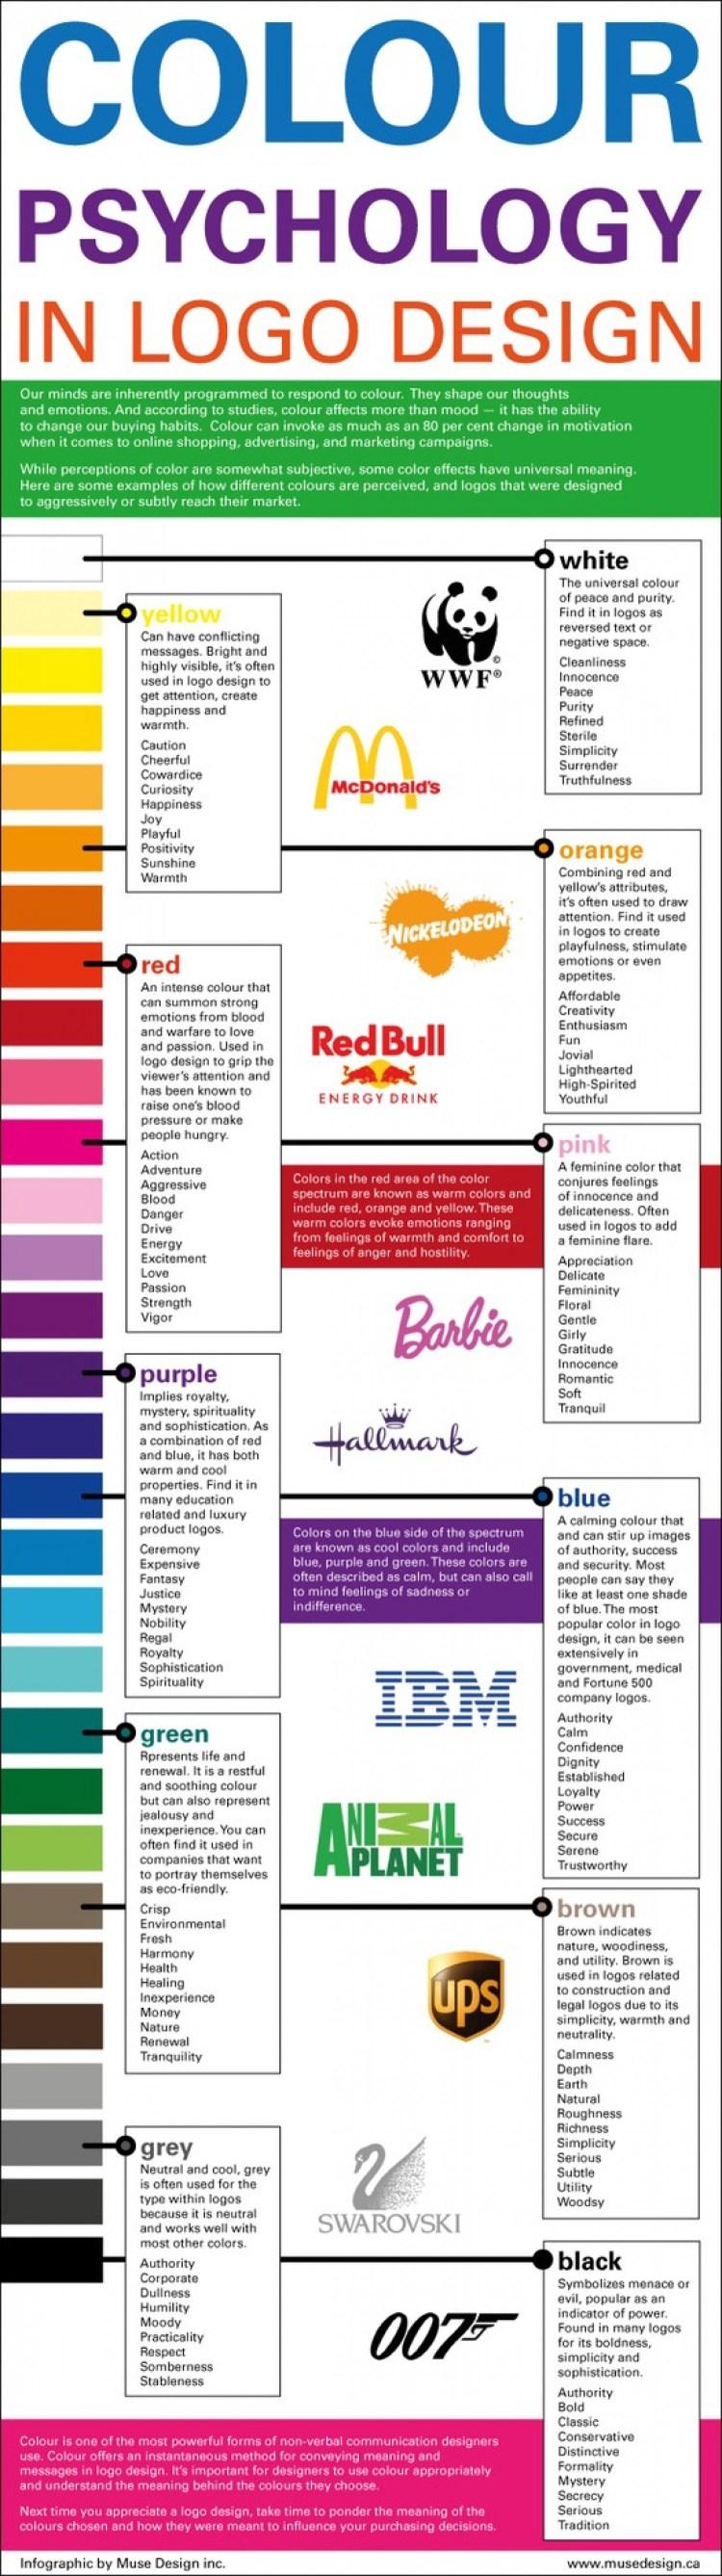 ColorPsychology_LogoDesign_01